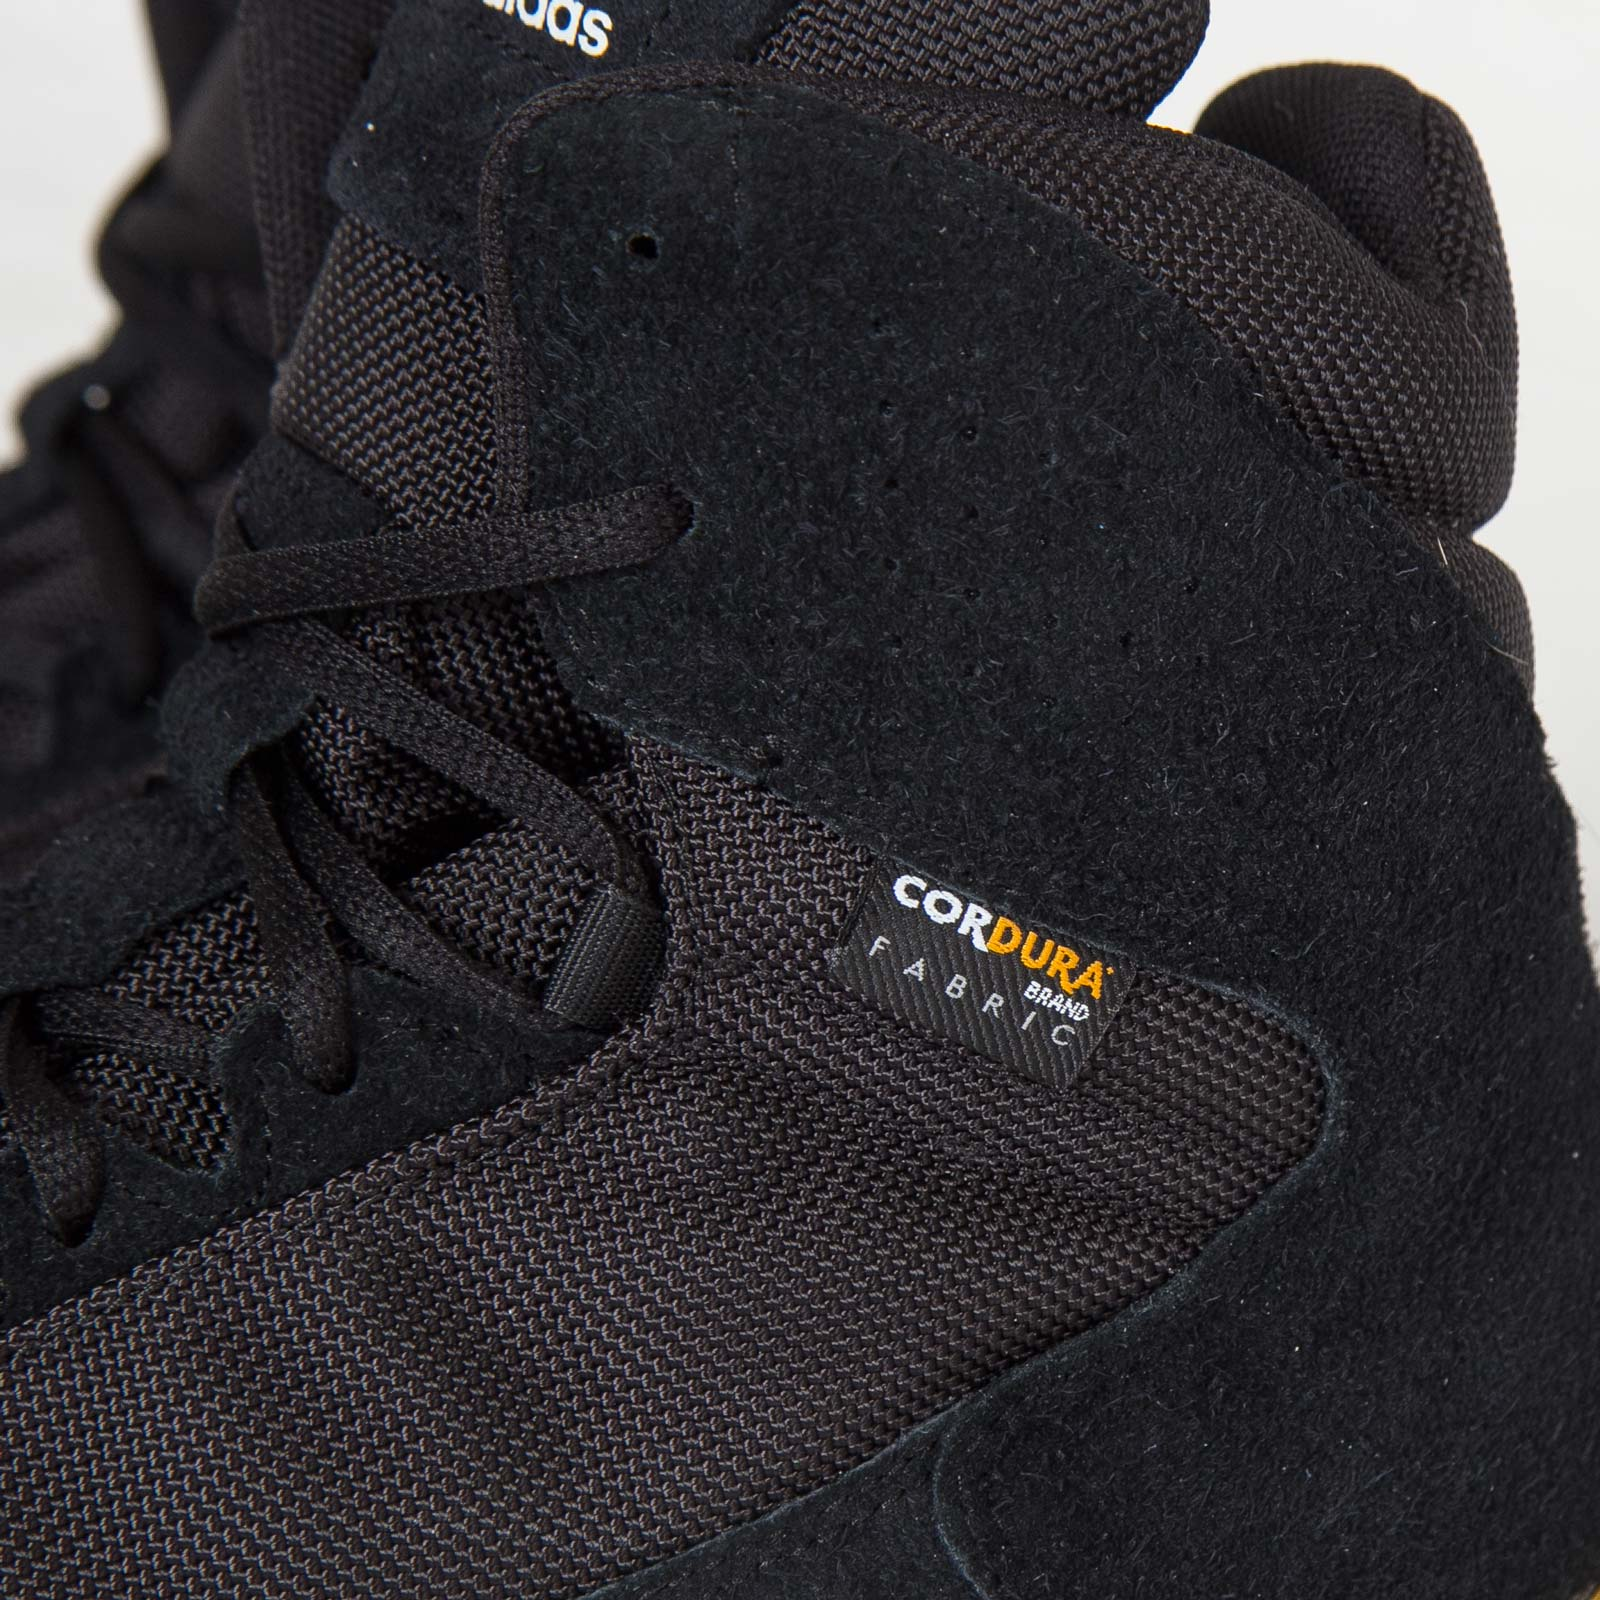 072f4ec0f323 adidas Tubular GSG9 - S82516 - Sneakersnstuff